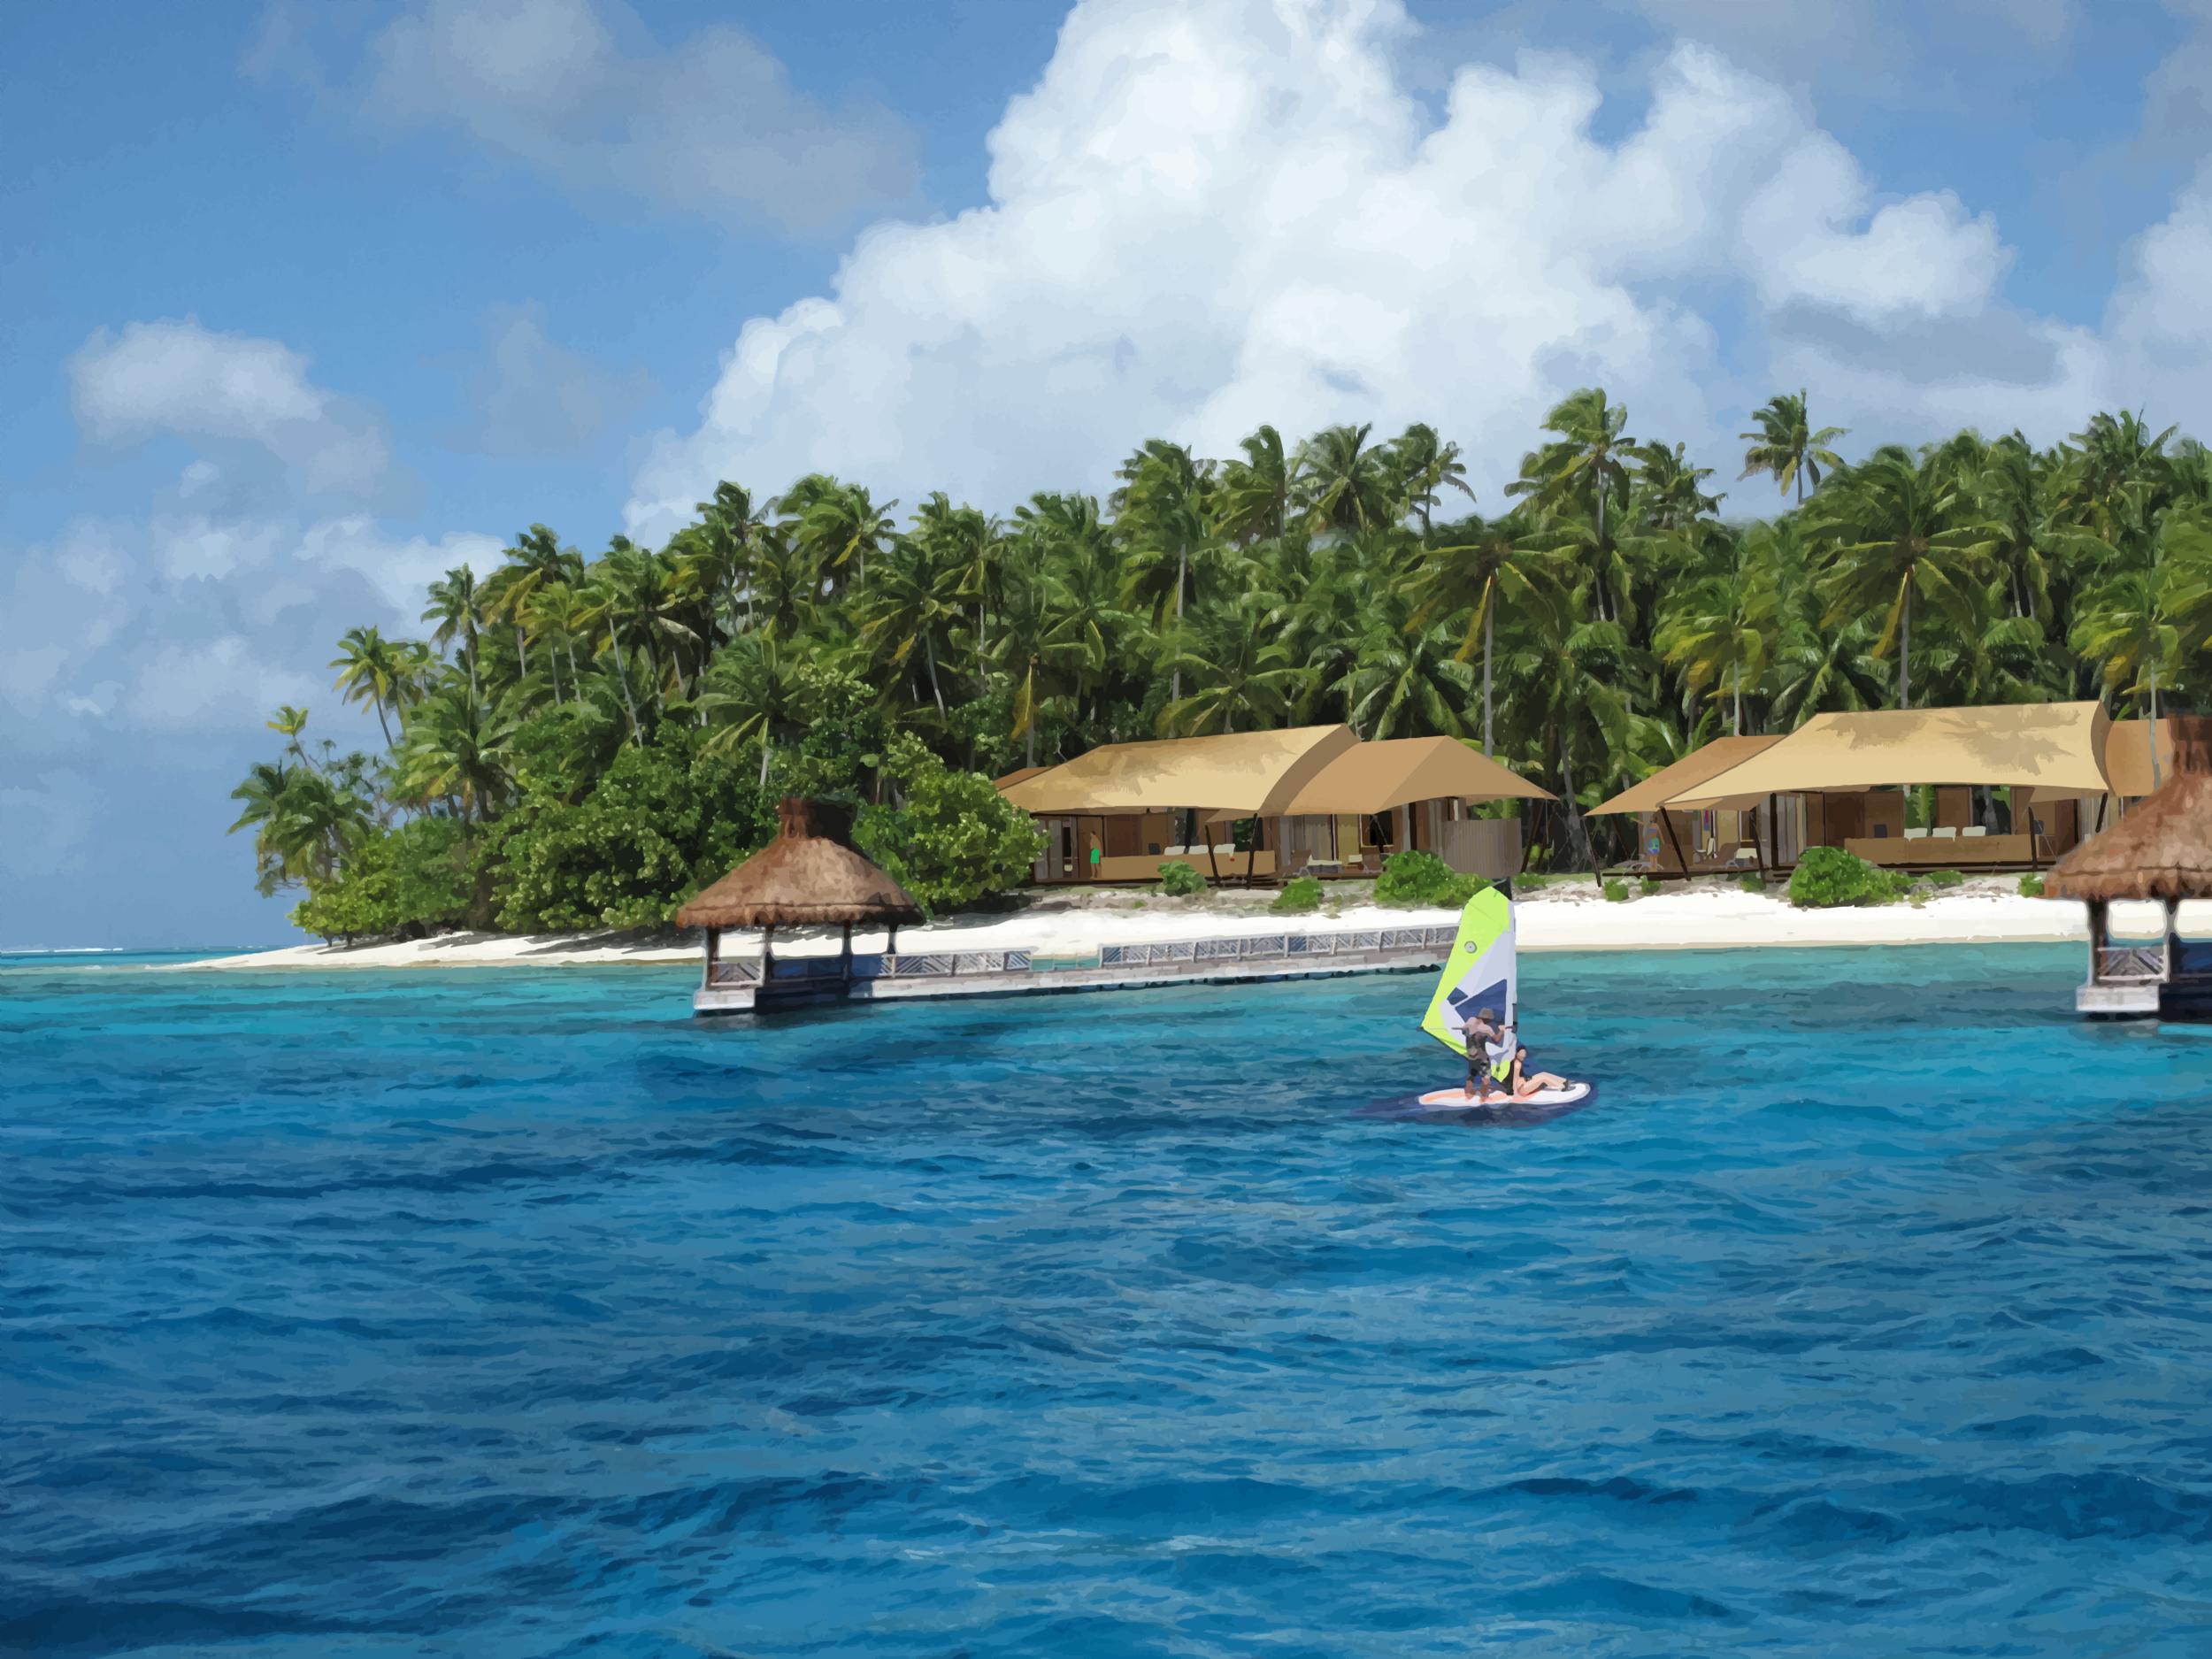 S.E.A.-Studio-Environmental-Architecture-David-Hertz-FAIA-Beran-East-Indies-Trader-Watermans-Resort-Papua-New-Guinea-sustainable-regenerative-restorative-green-design-hospitality-tropical-resort-hotel-biomimetic-tensile-structure-site-render-2.png